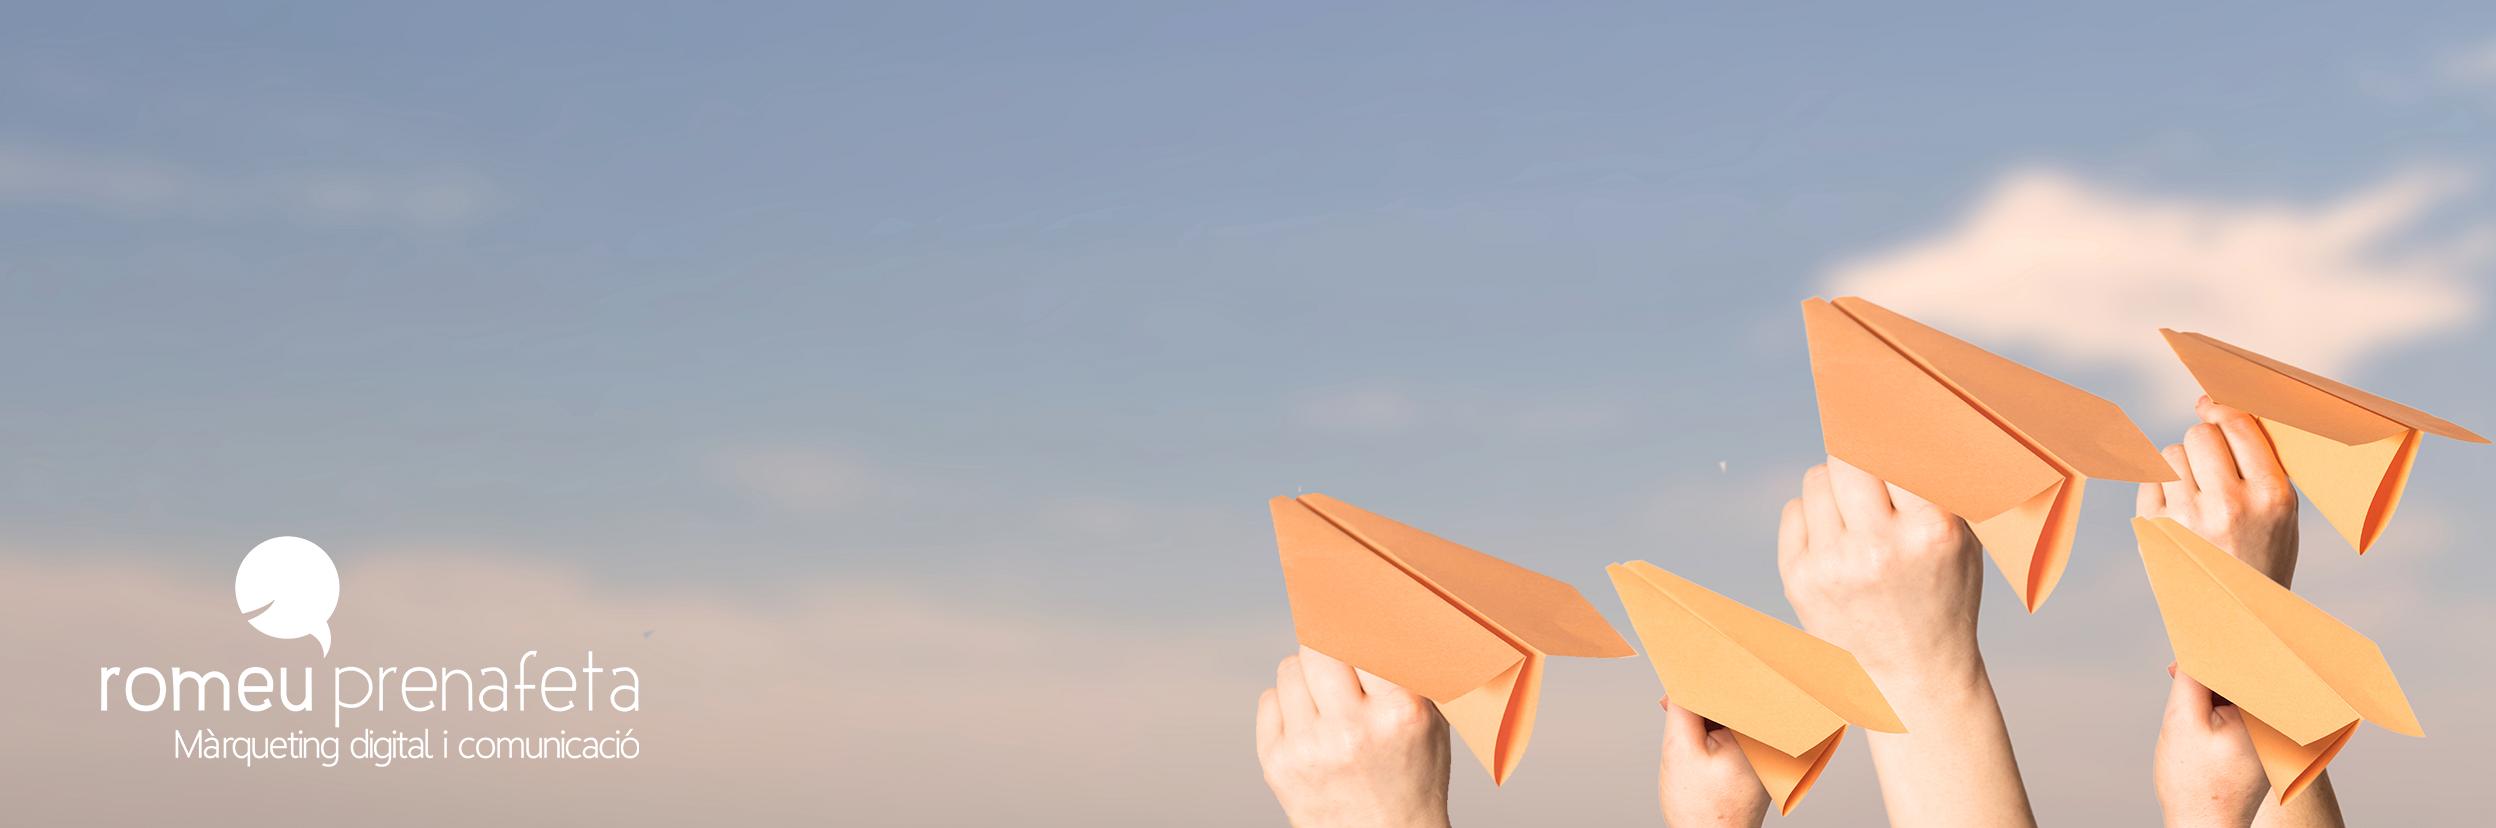 5 maneres de fer màrqueting